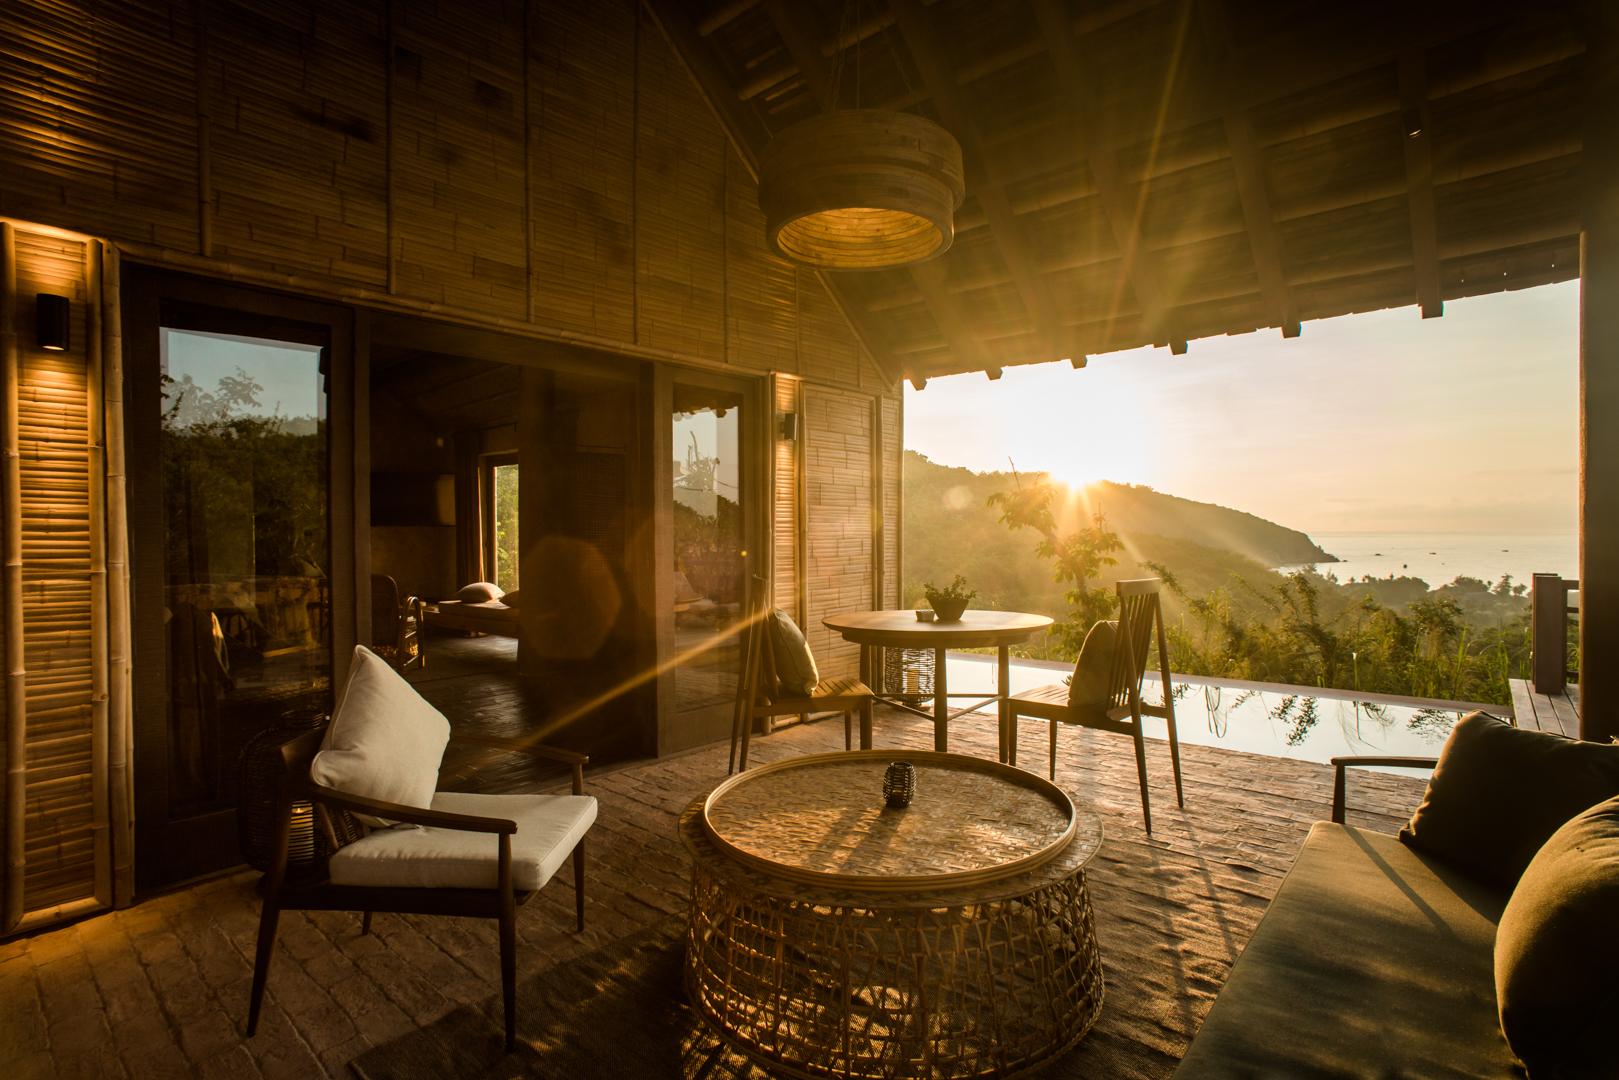 Zannier-Hotels-Bãi-San-Hô-Hill-Pool-Villa-Exterior-5-©-Frederik-Wissink-for-Zannier-Hotels